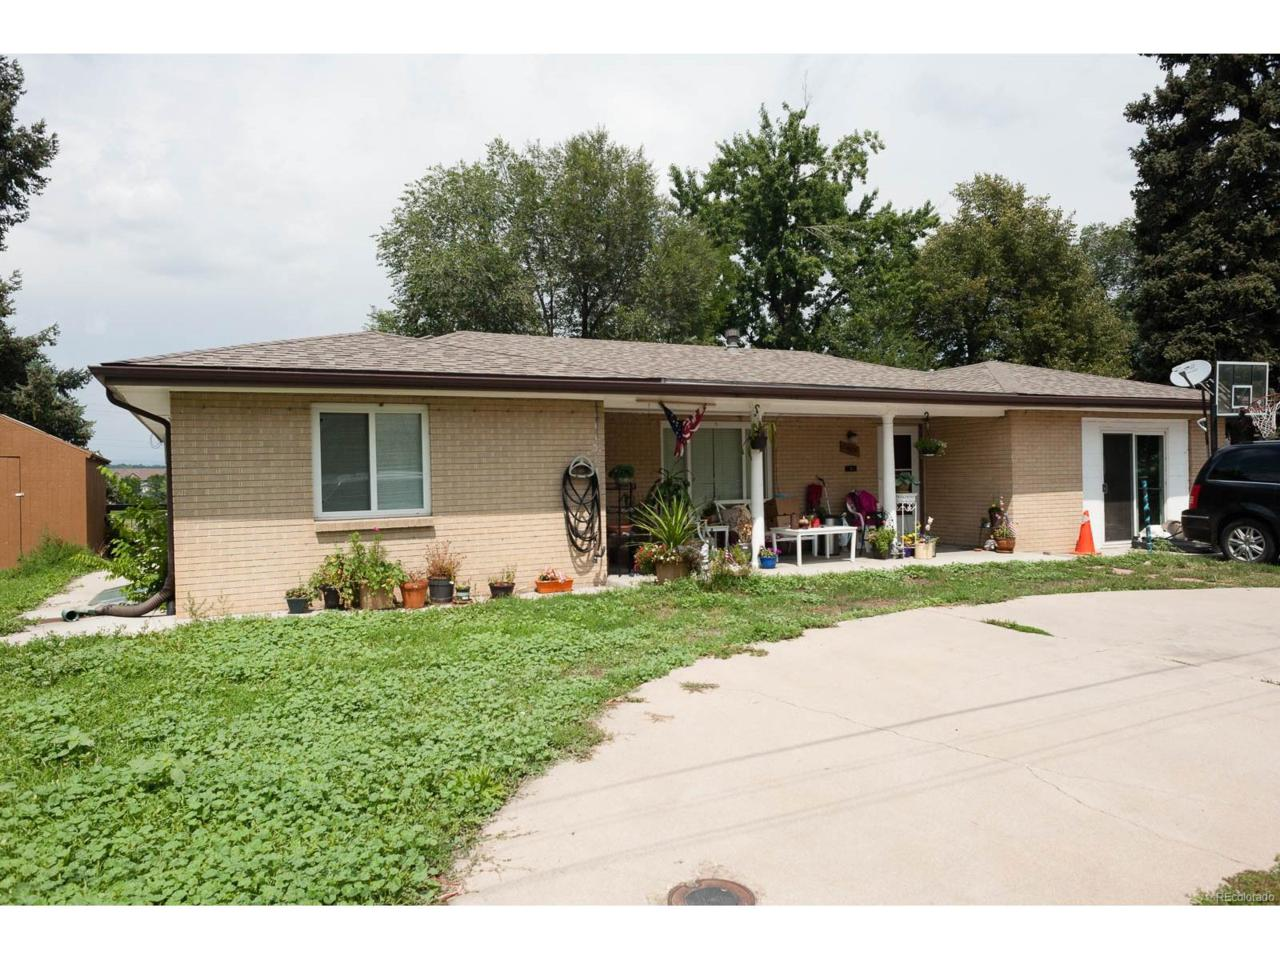 5469 S Curtice Street, Littleton, CO 80120 (MLS #9679783) :: 8z Real Estate